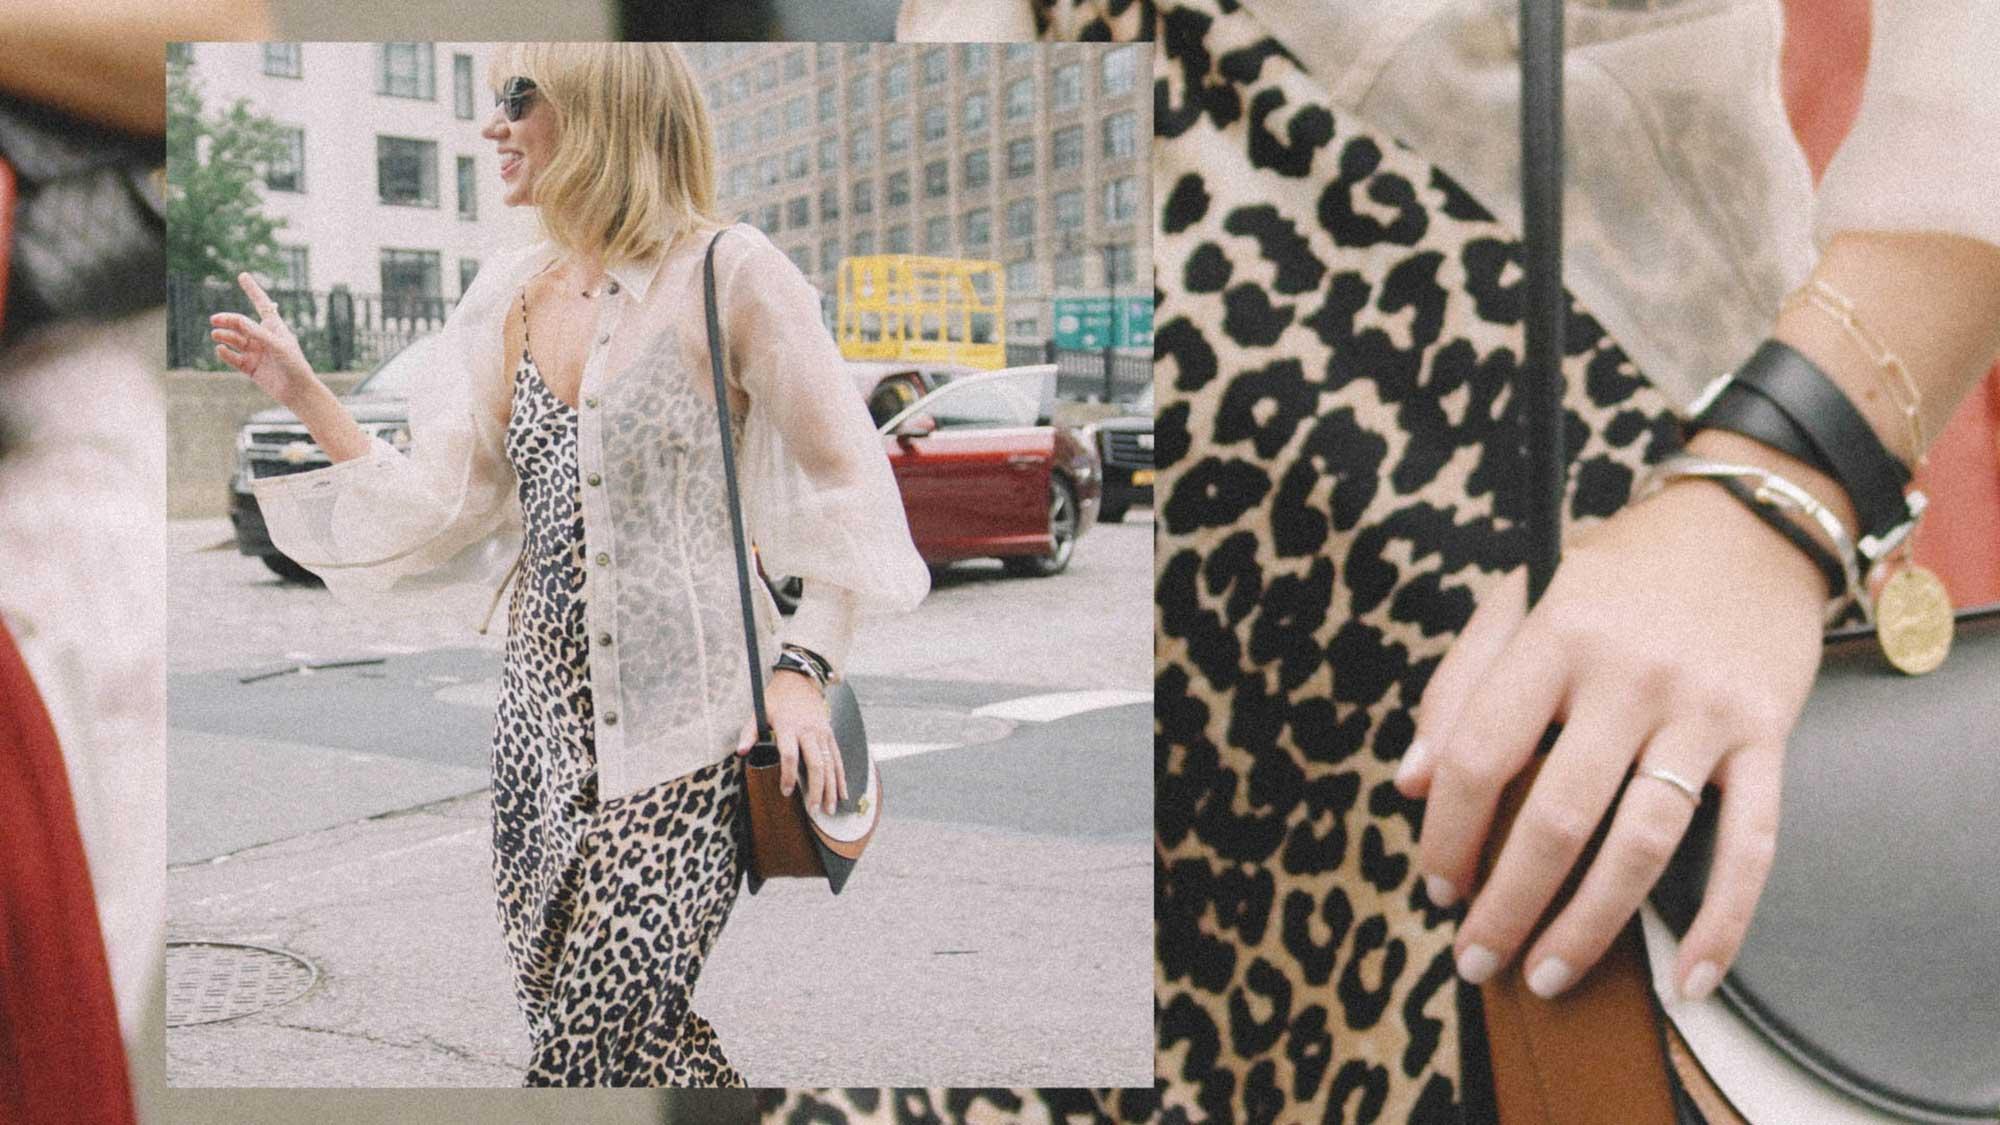 10 Easy Ways to Pull Off Leopard Print, leaopard print slip dress, Lisa Aiken street style.jpg